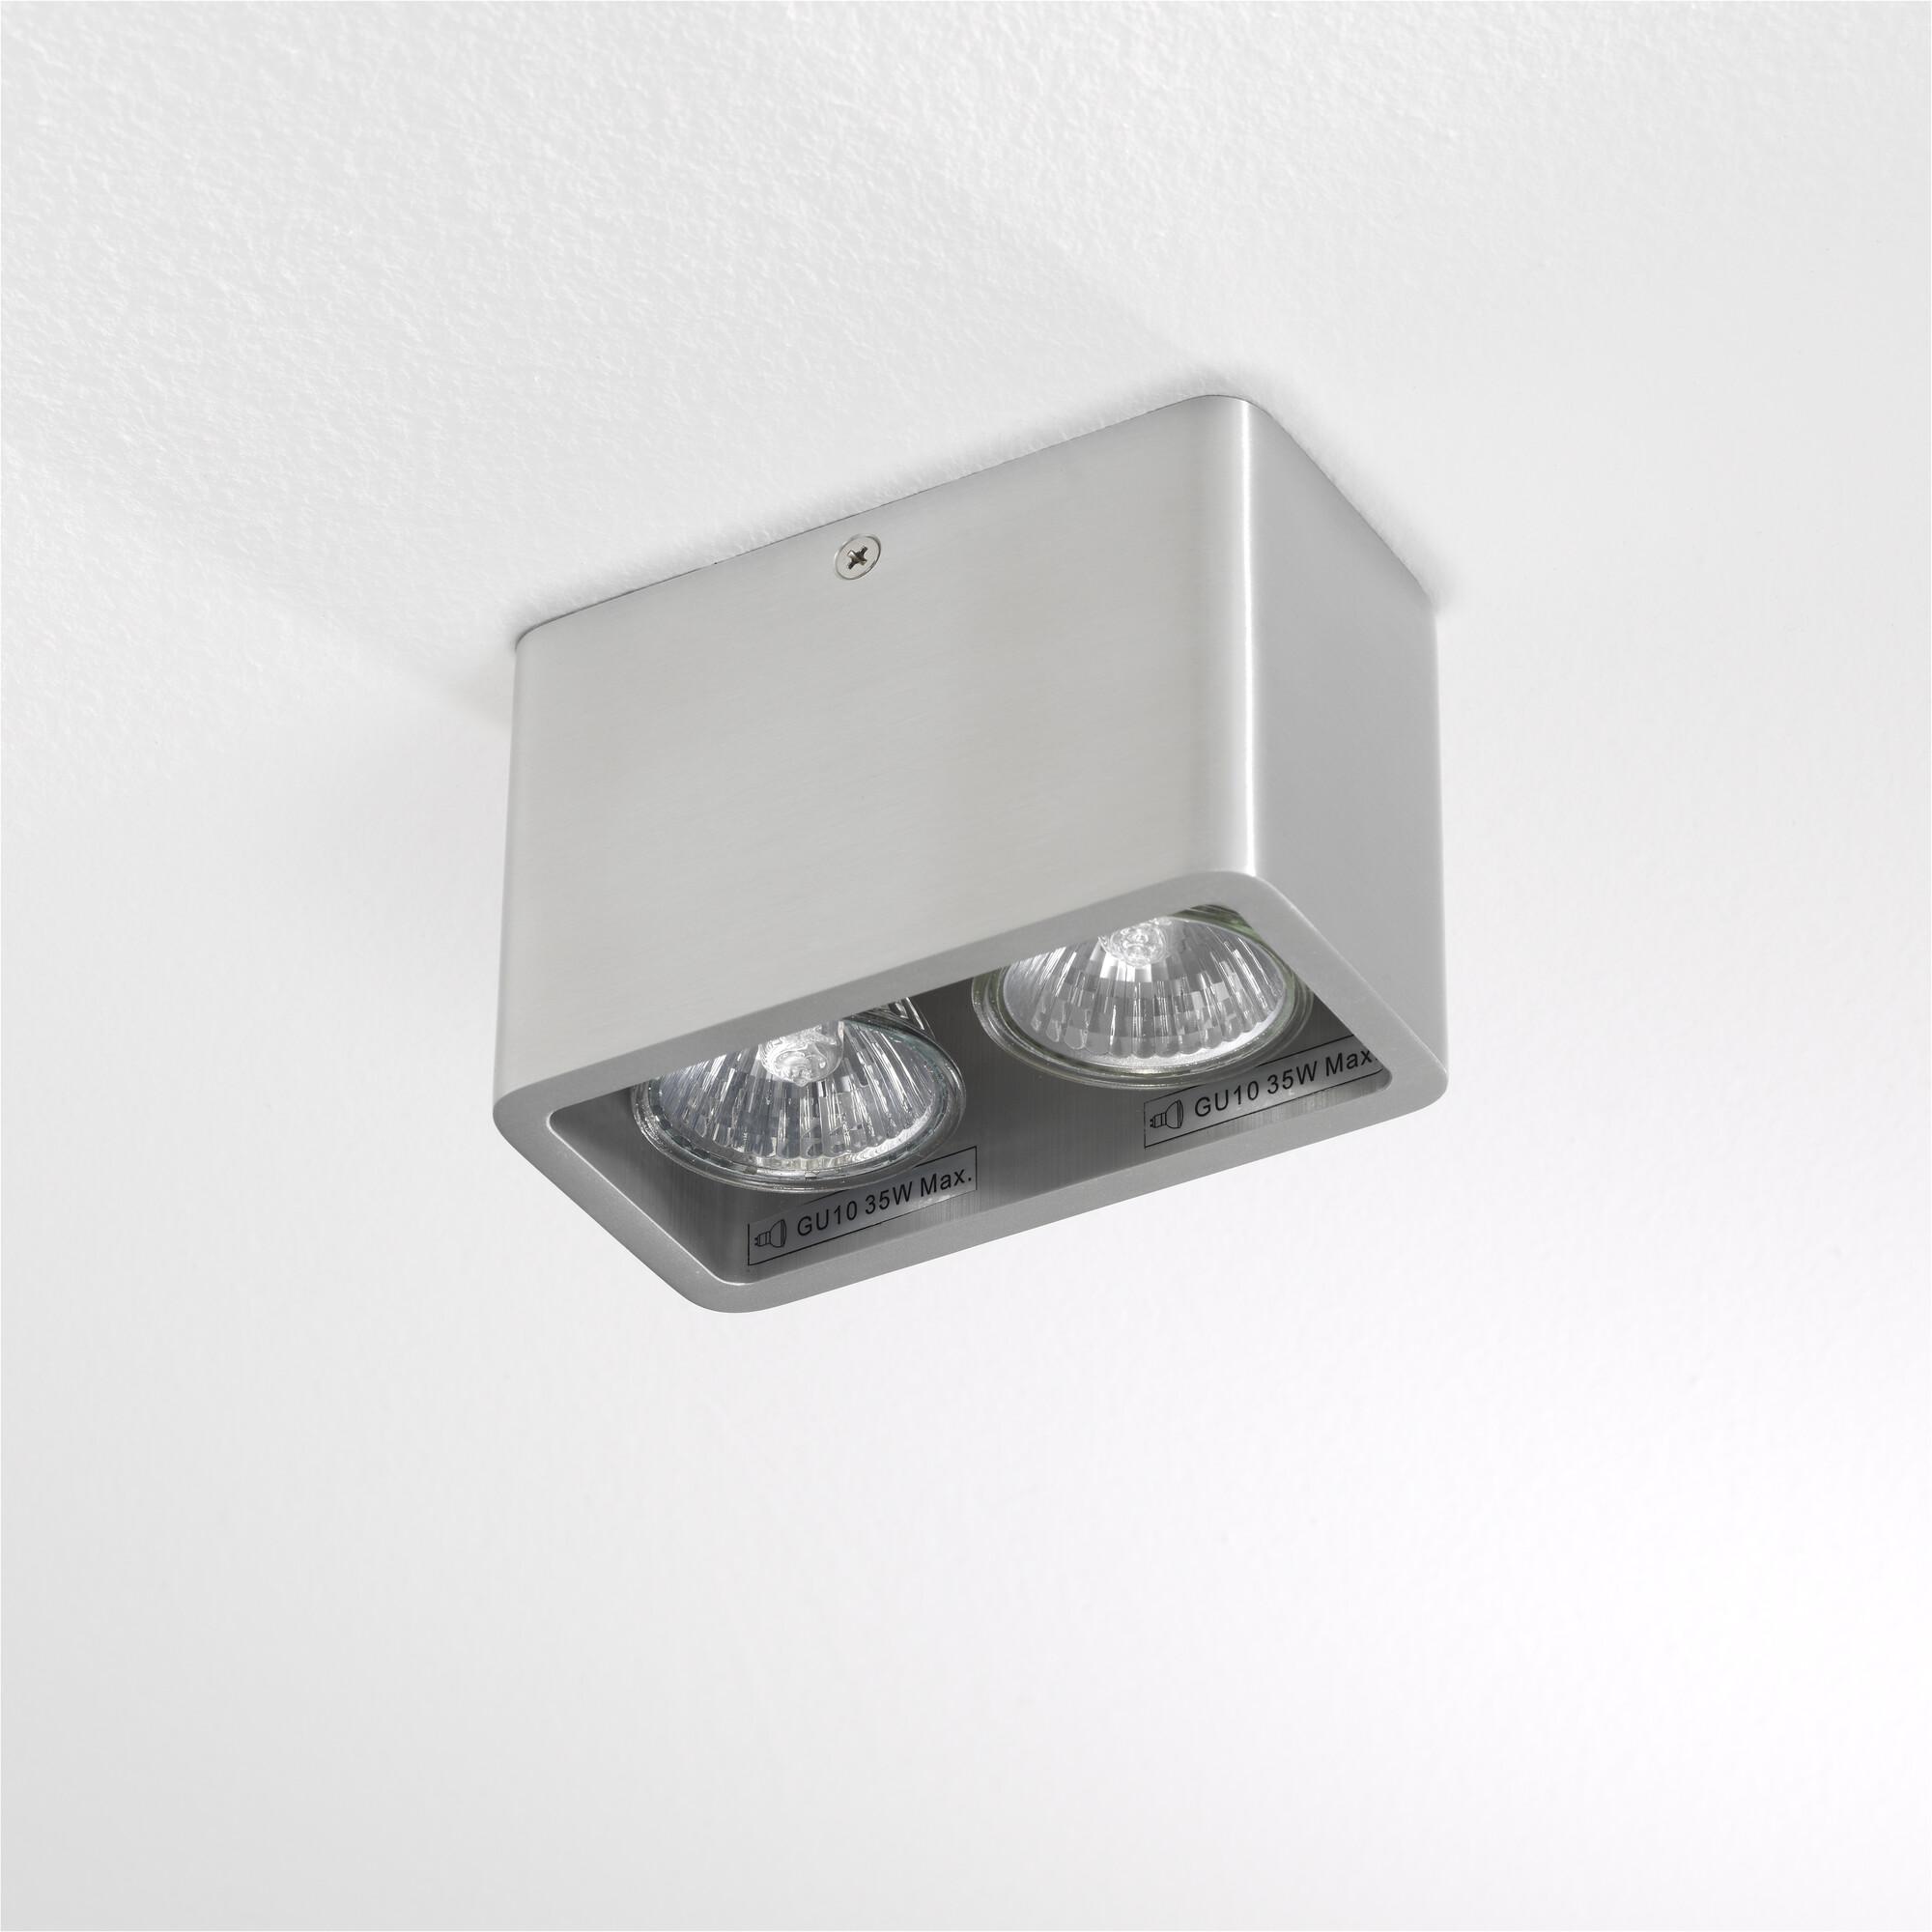 MONI Opbouwspot GU10 2x Zilver